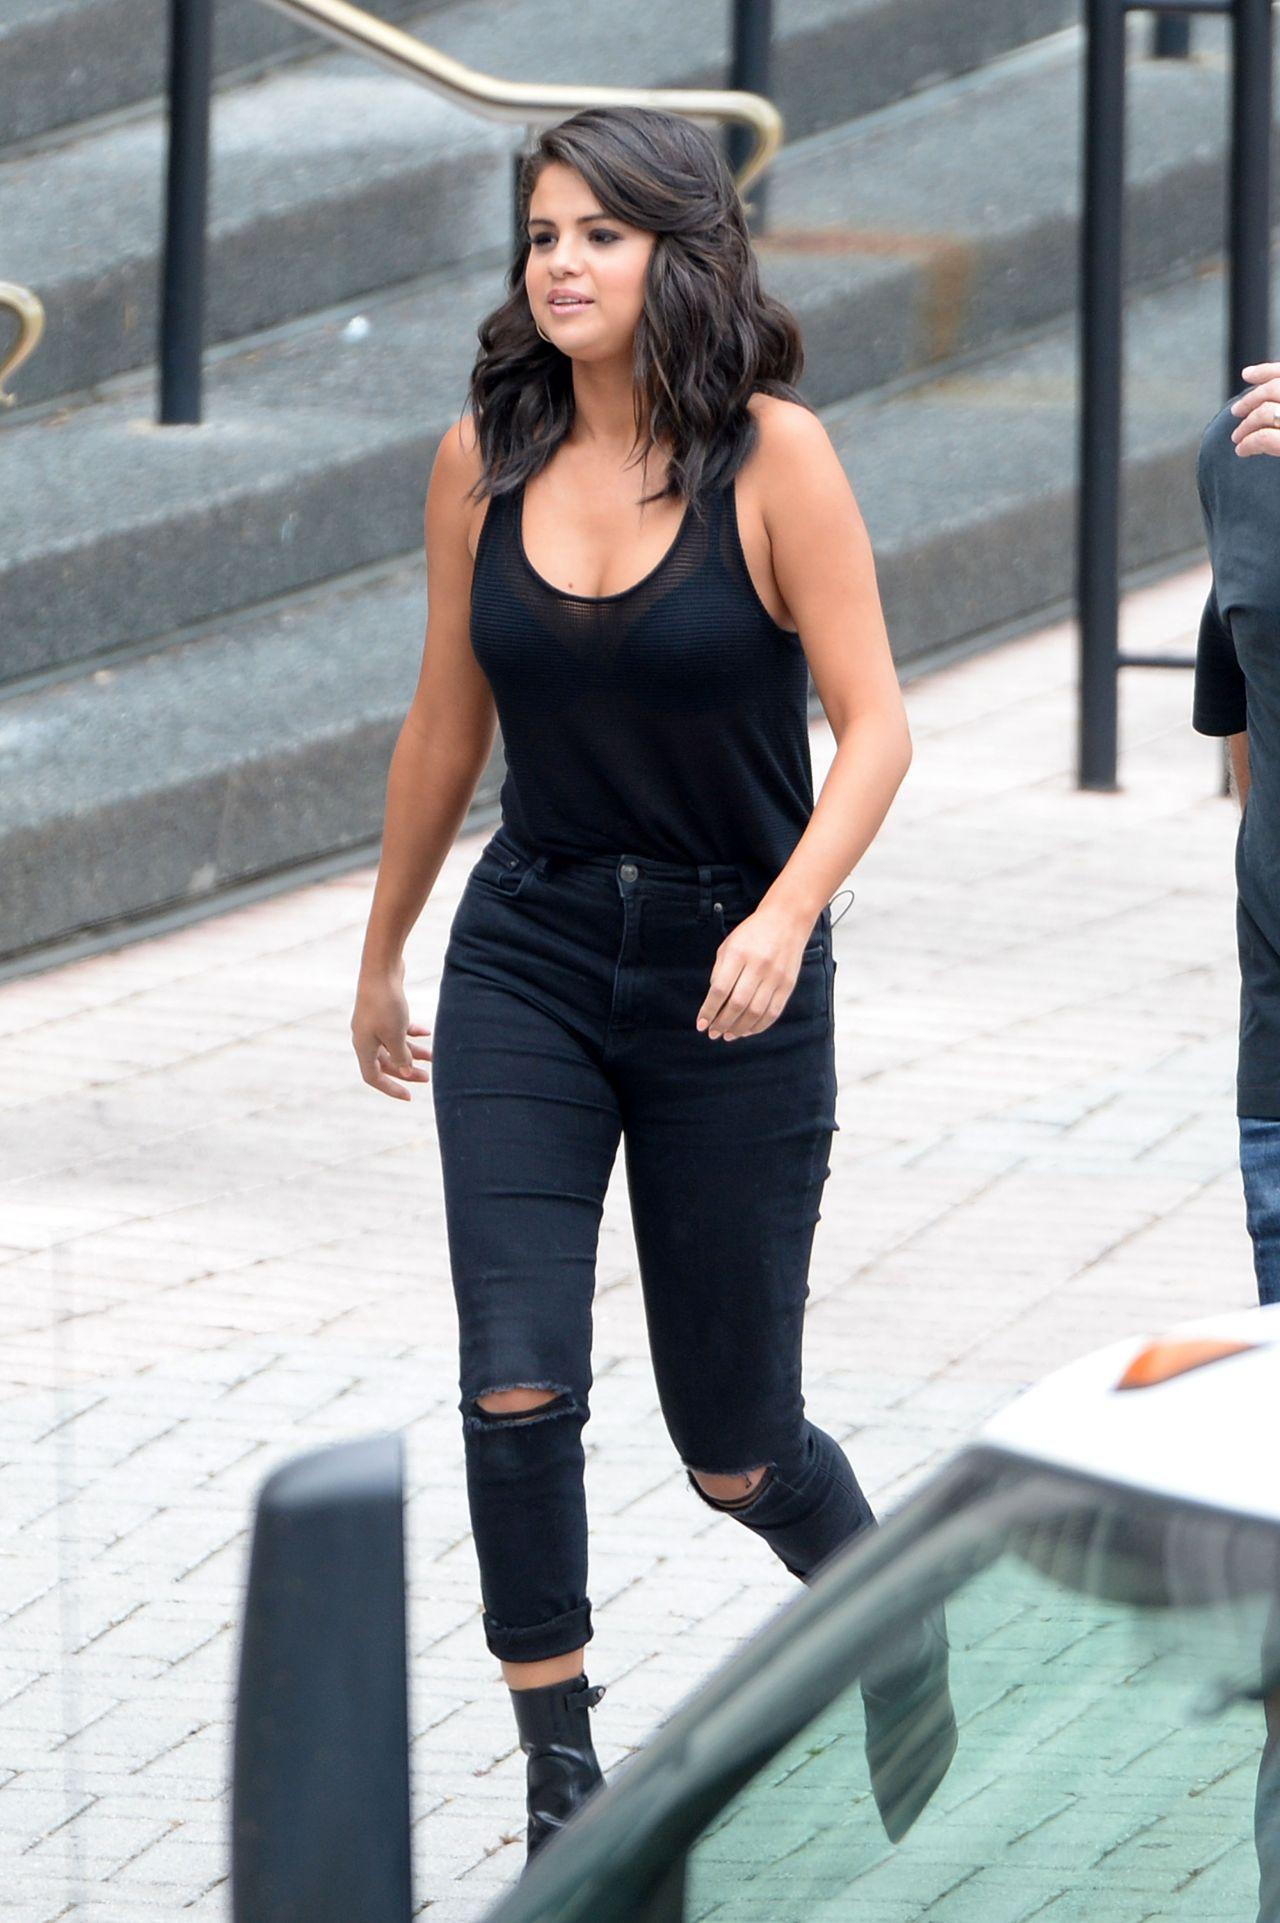 Girl Jeans Top Wallpaper Selena Gomez Leaving A Casino In New Orleans Louisiana